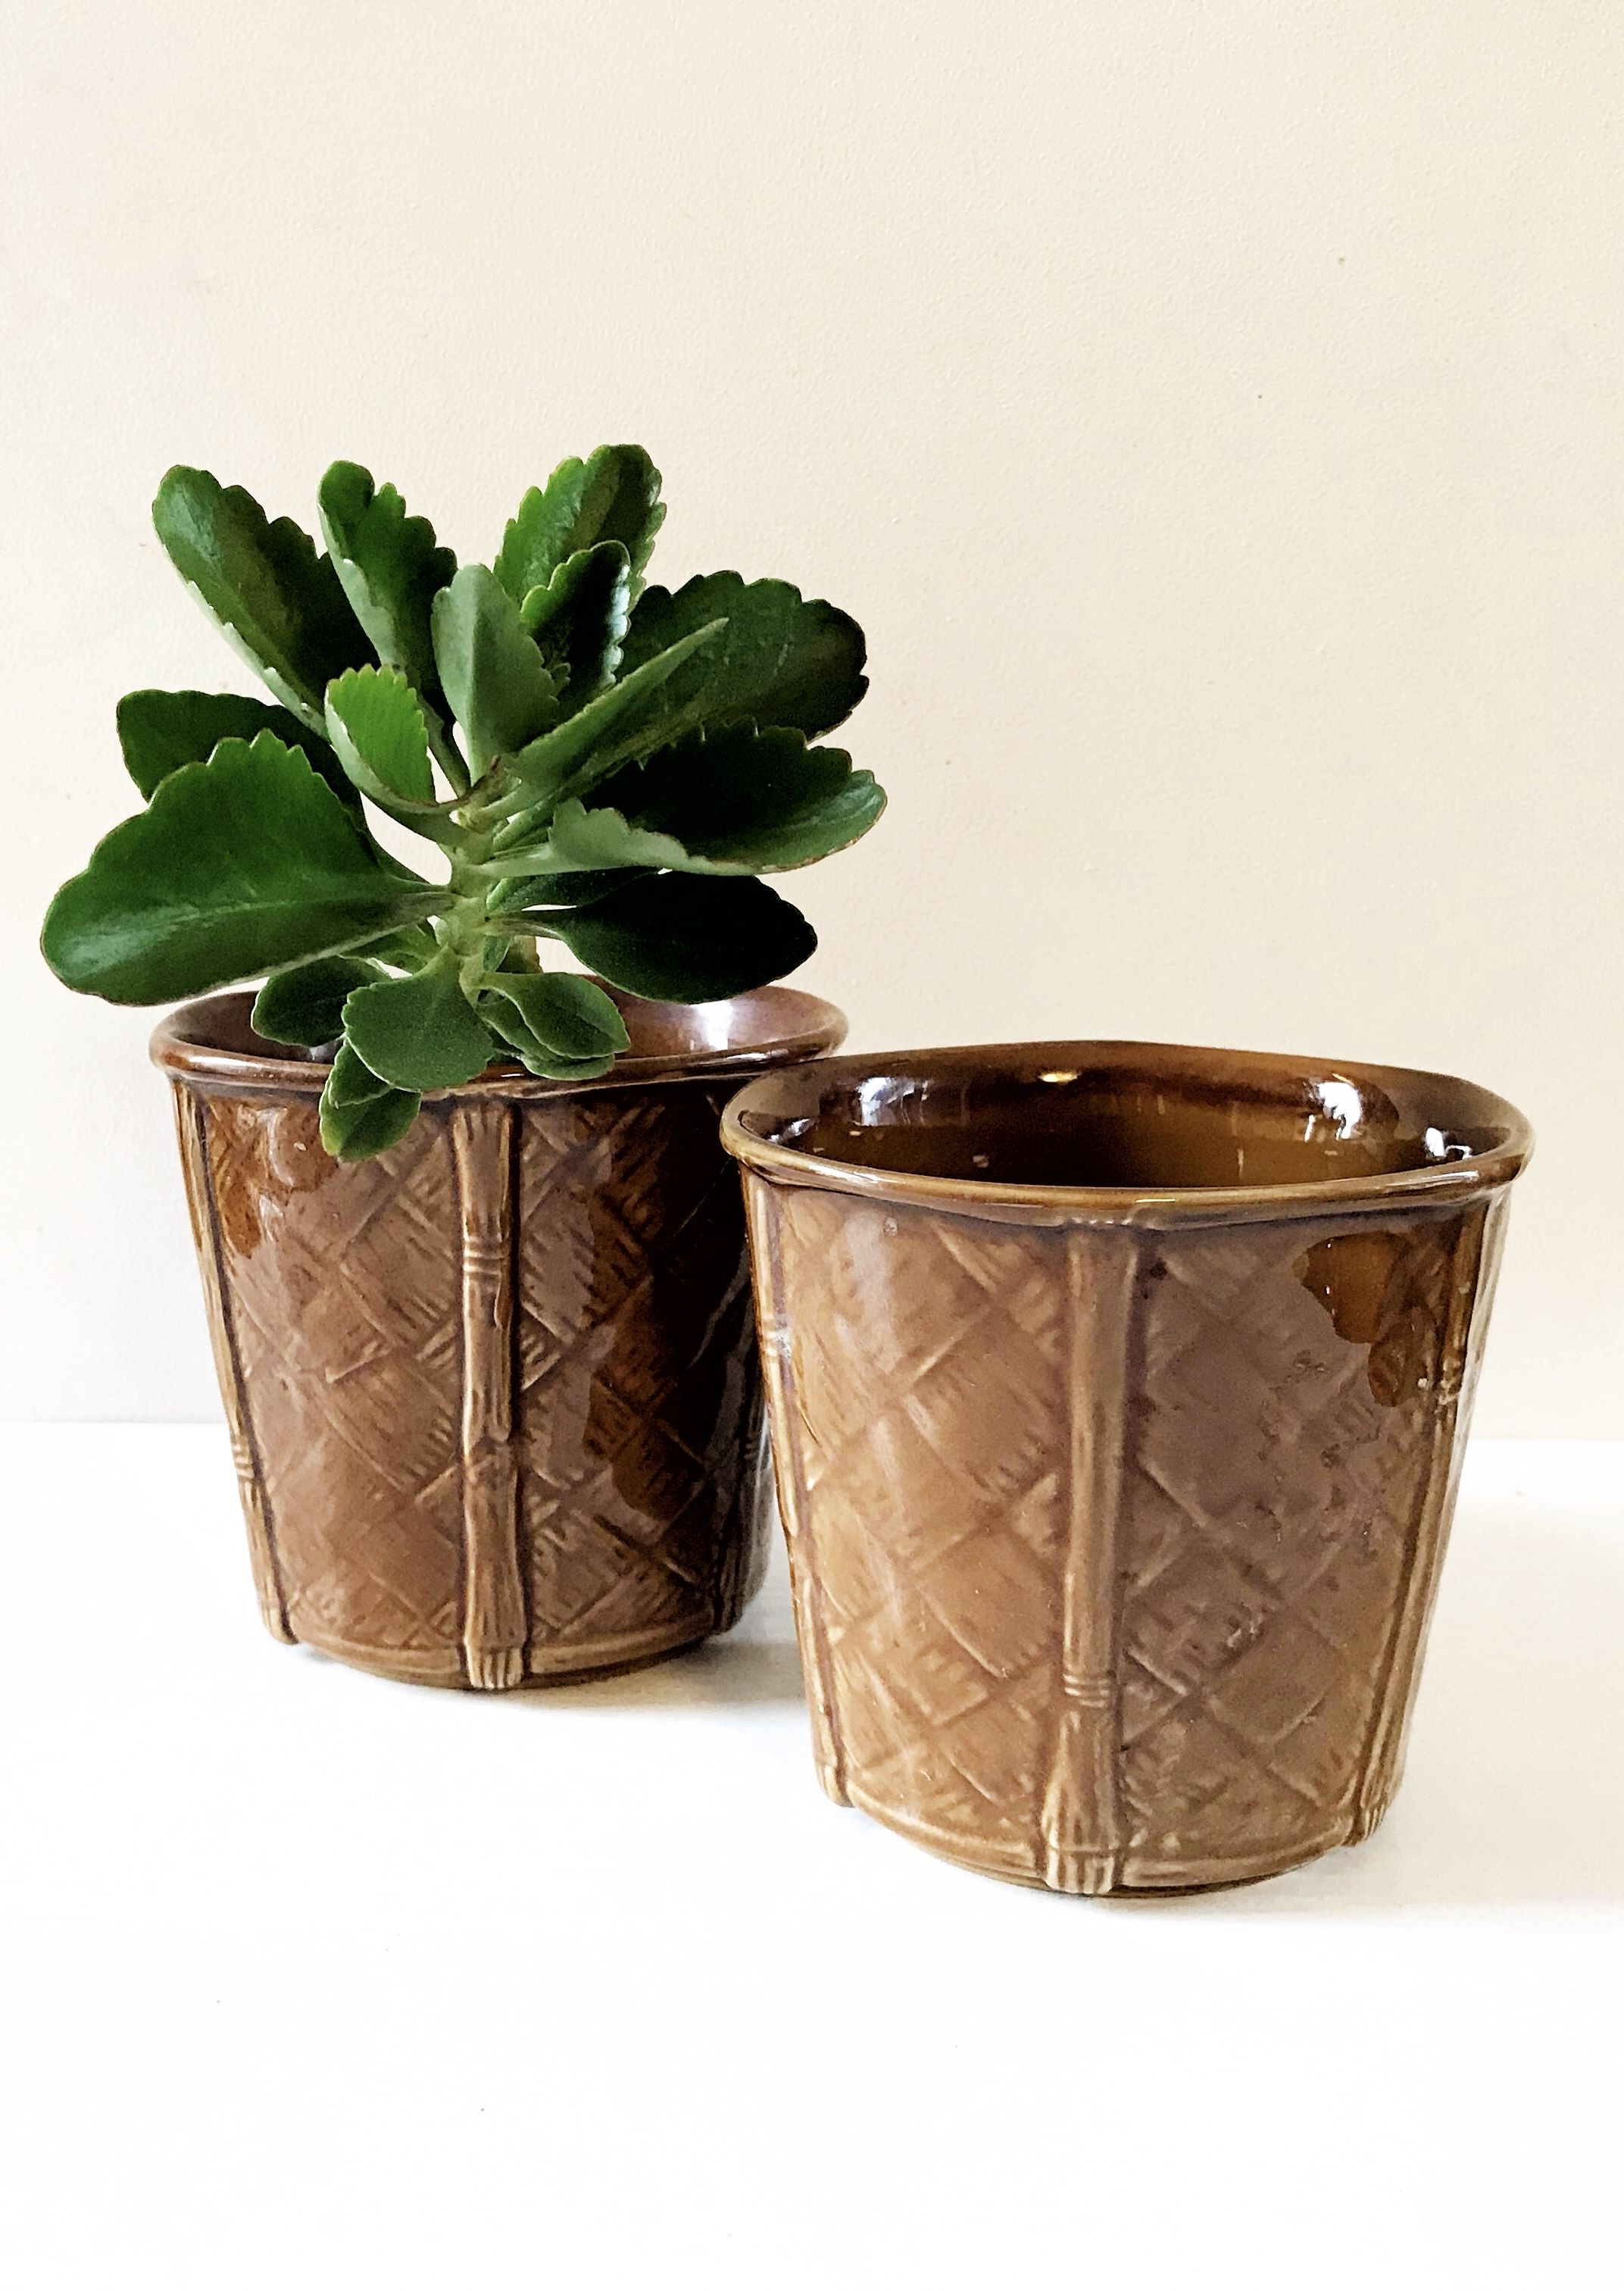 Cheap Small Gl Vases Uk on small tables cheap, small chairs cheap, small baskets cheap, small trophies cheap, small handbags cheap, small fish bowls cheap, small clocks cheap,